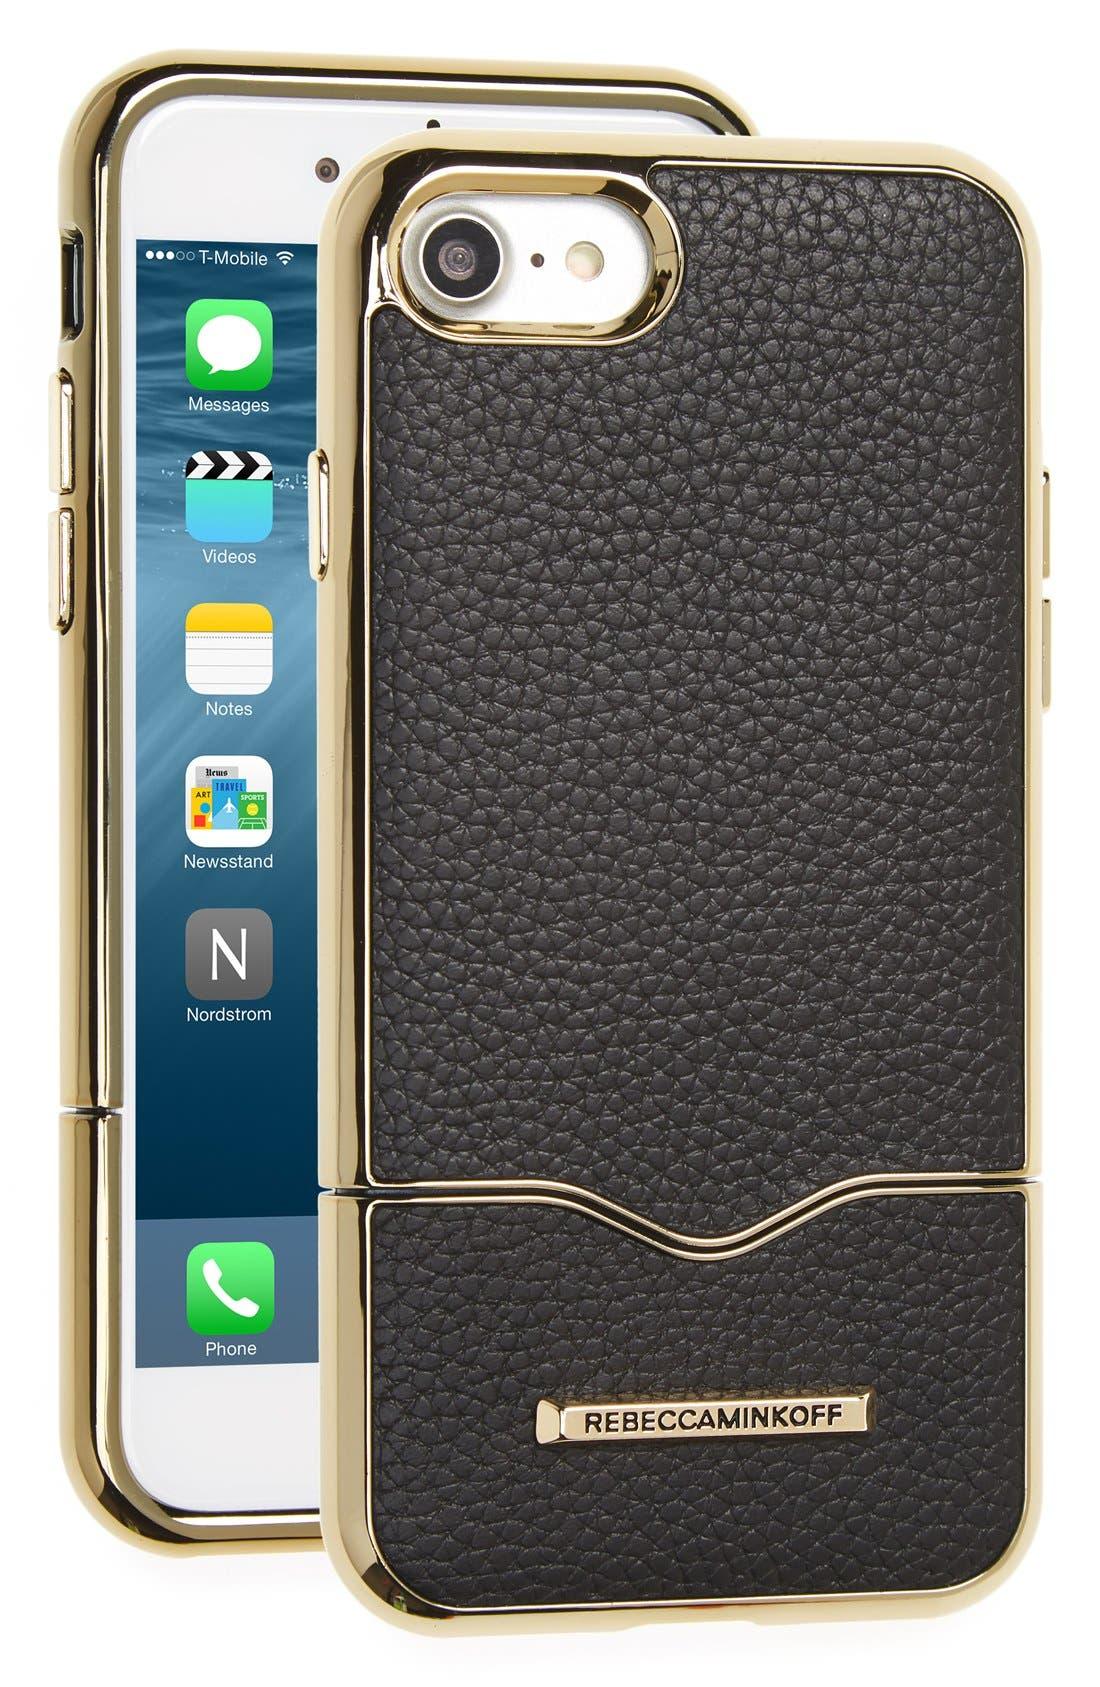 Rebecca Minkoff Leather iPhone 7 Slider Case